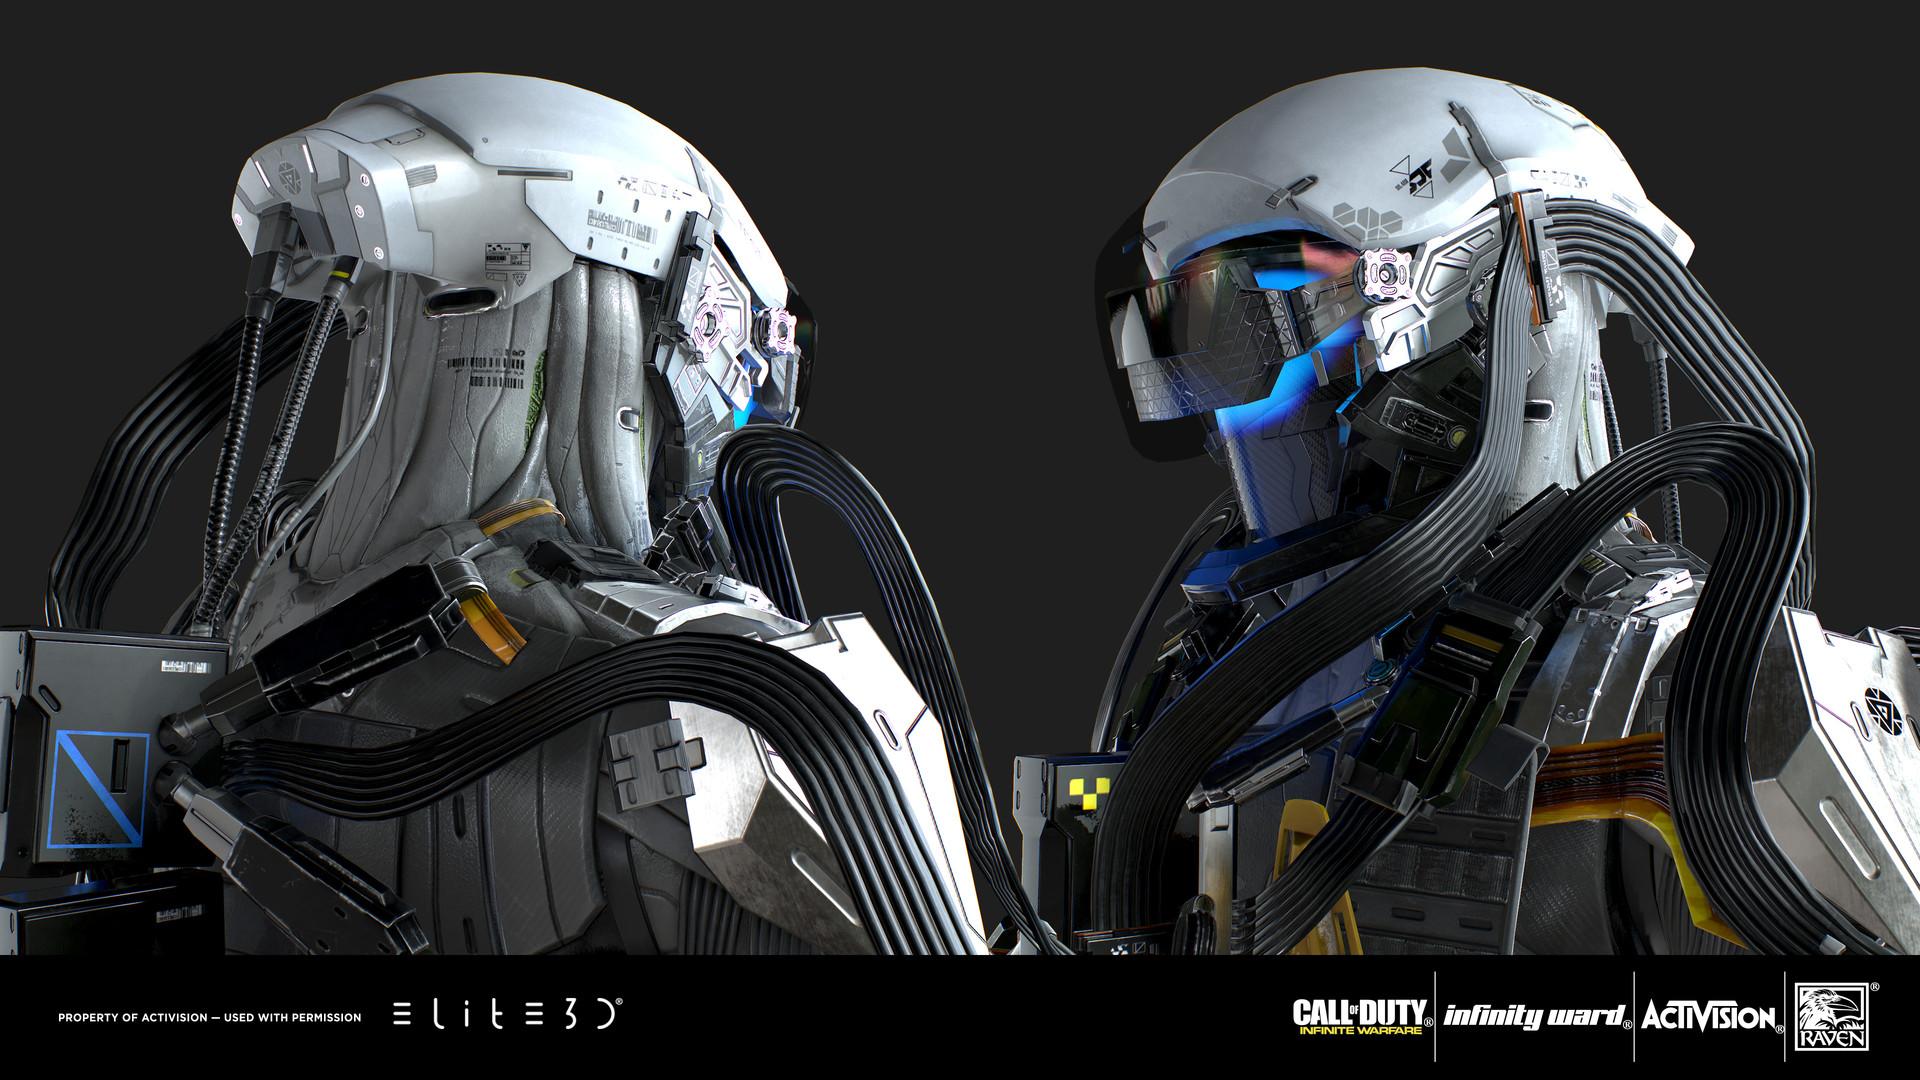 Call of Duty - Infinite Warfare FTL